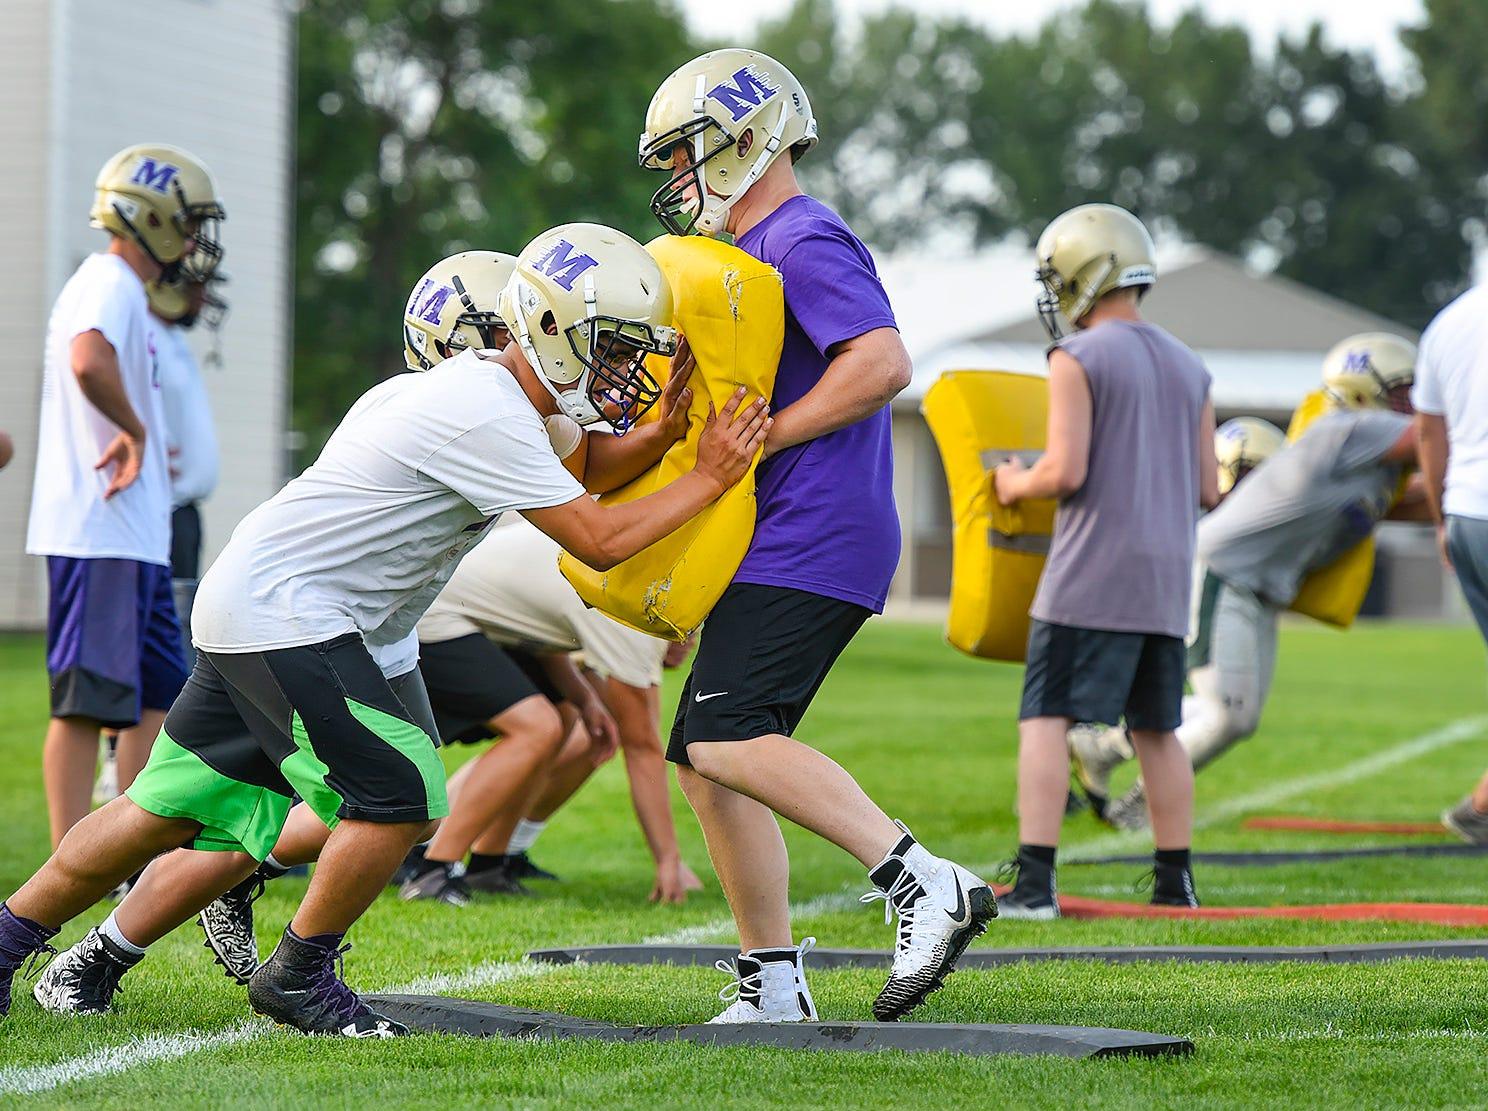 Melrose lineman work on blocking Wednesday, Aug. 15, during practice.